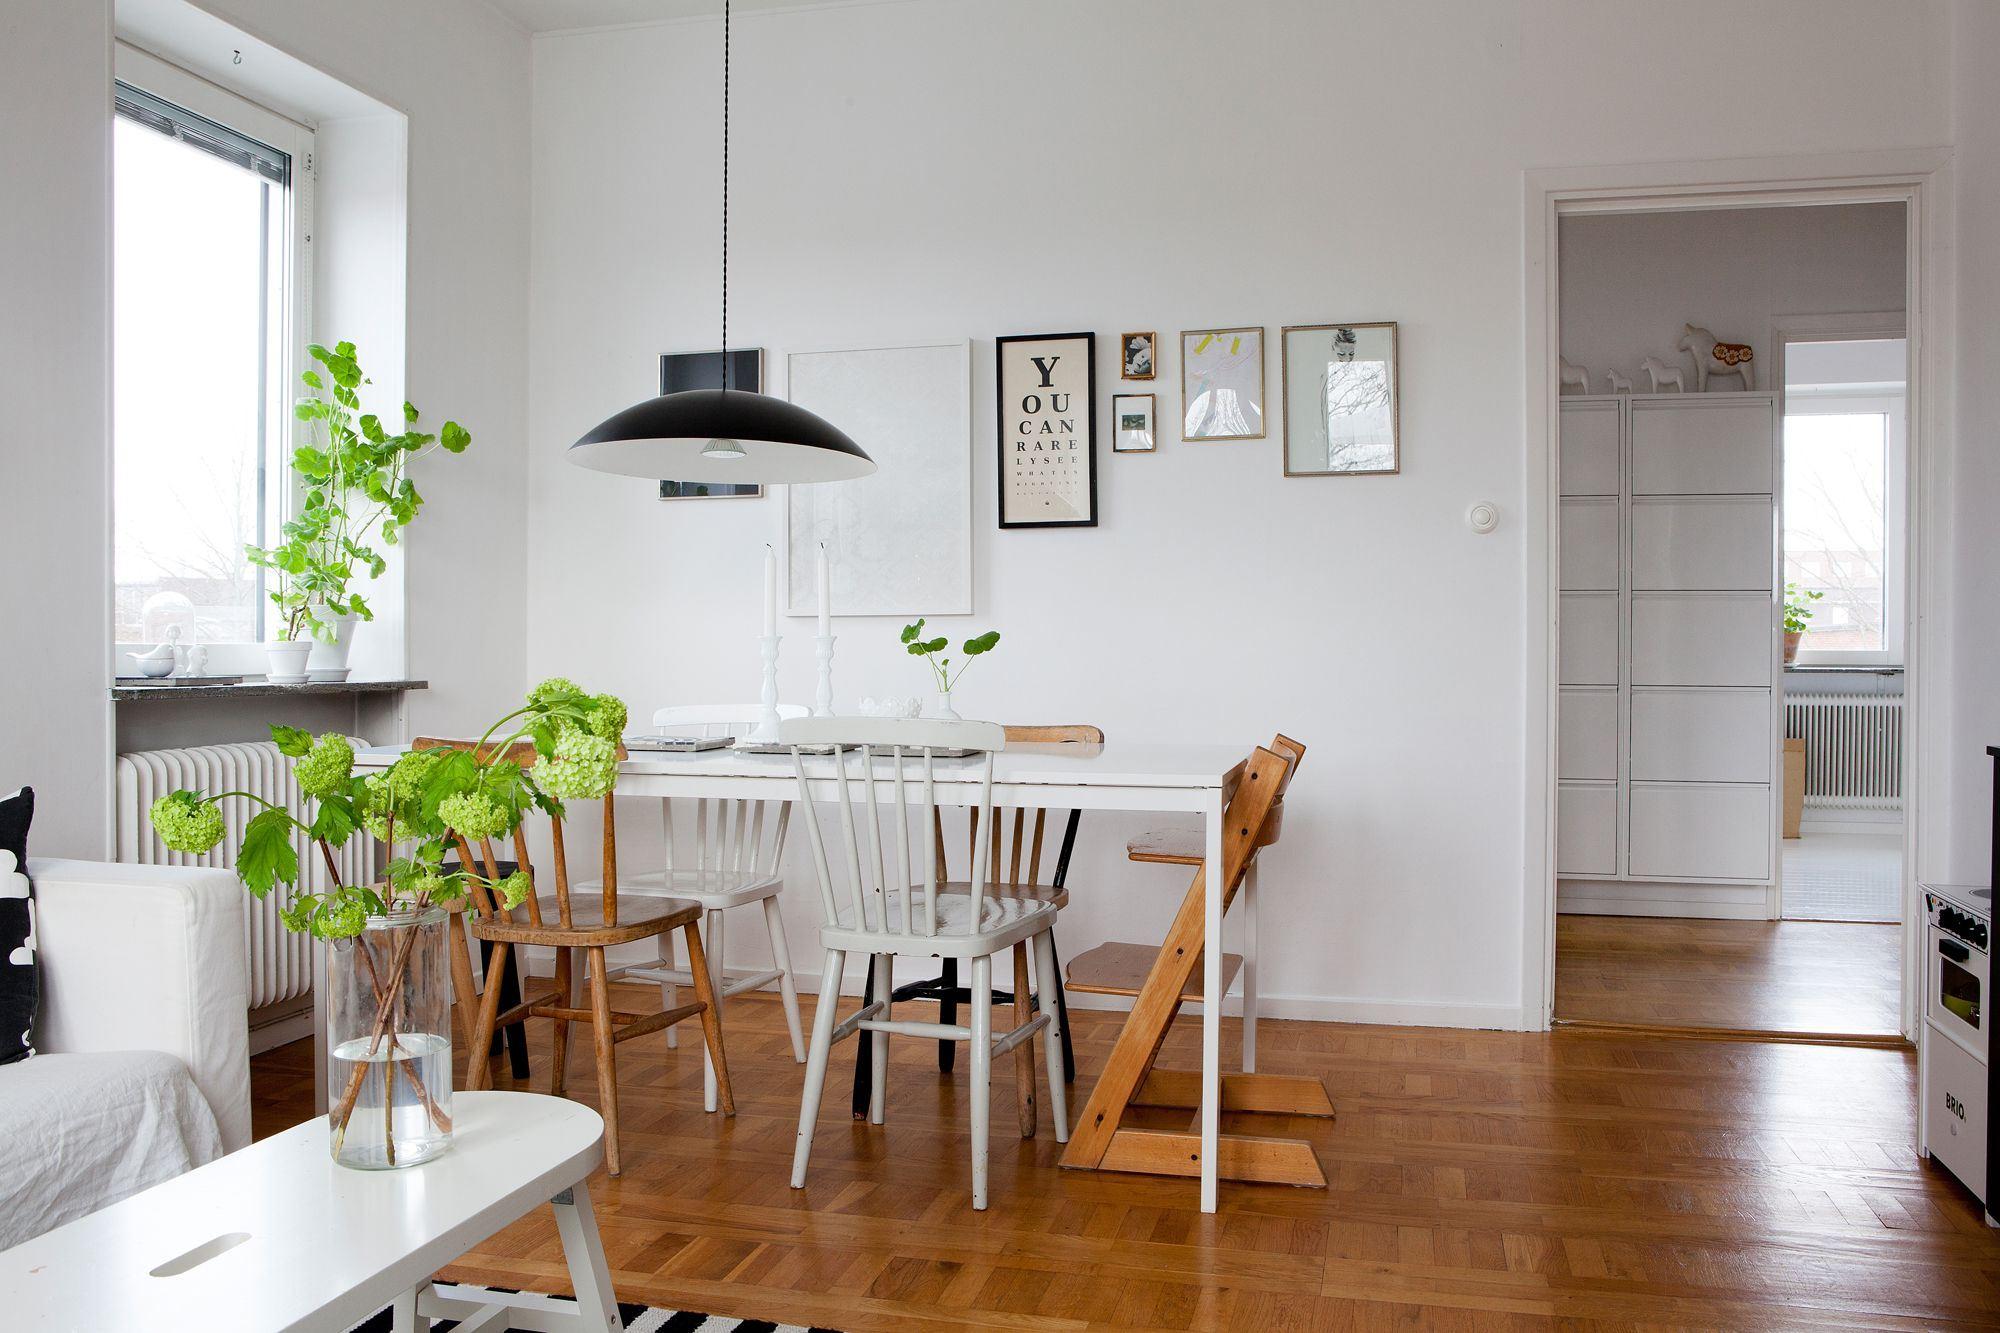 Fotos de pisos peque os decorados for Decorar piso pequeno fotos